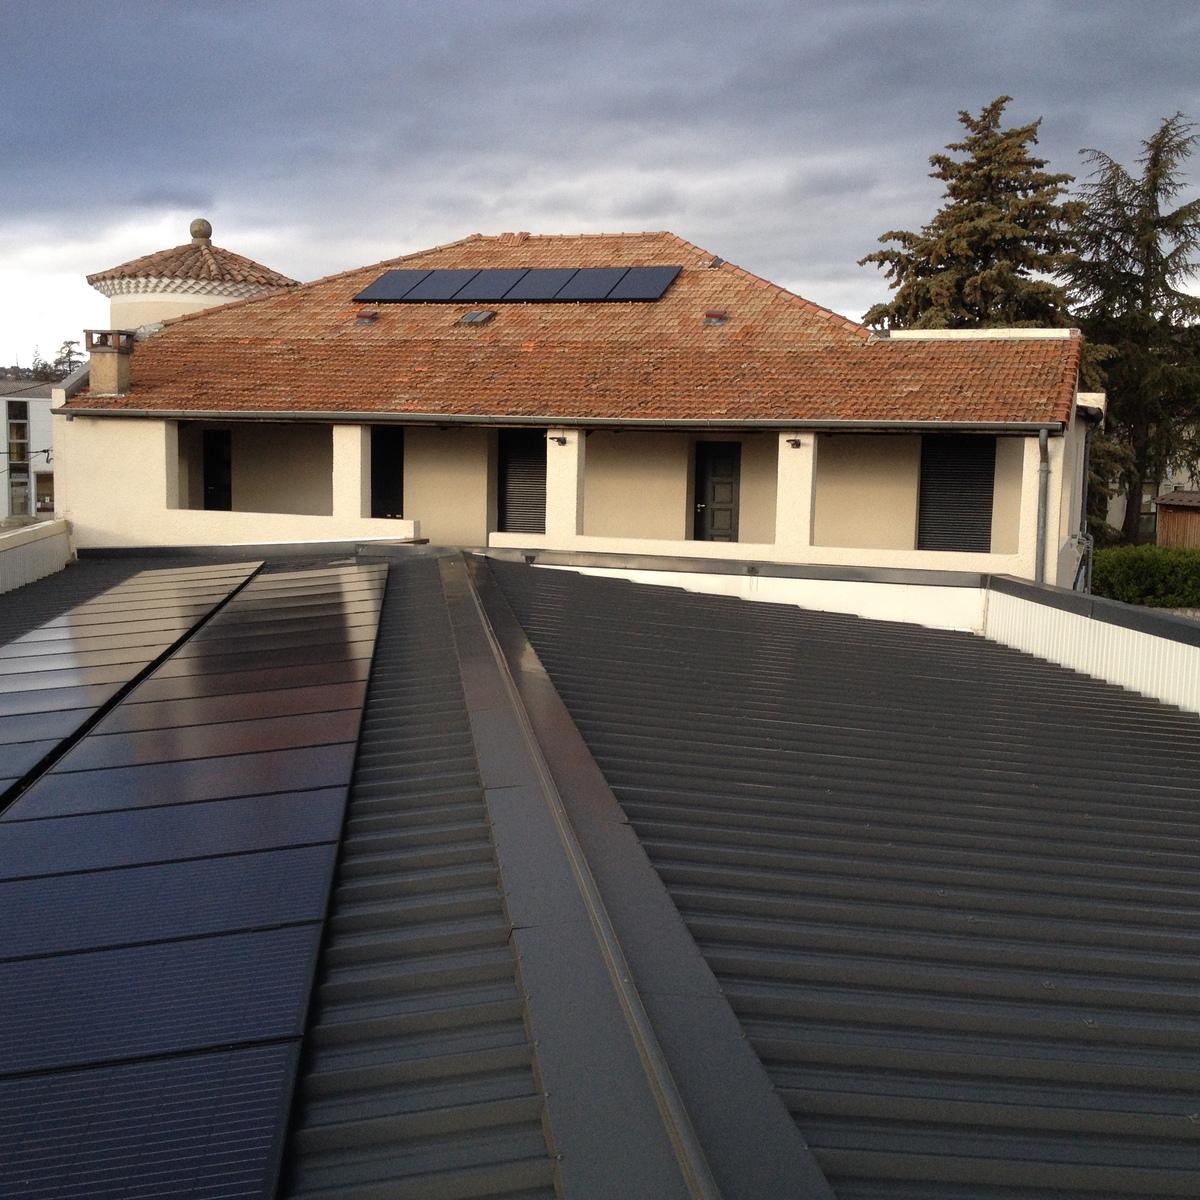 electricite innovation conseil photovoltaique